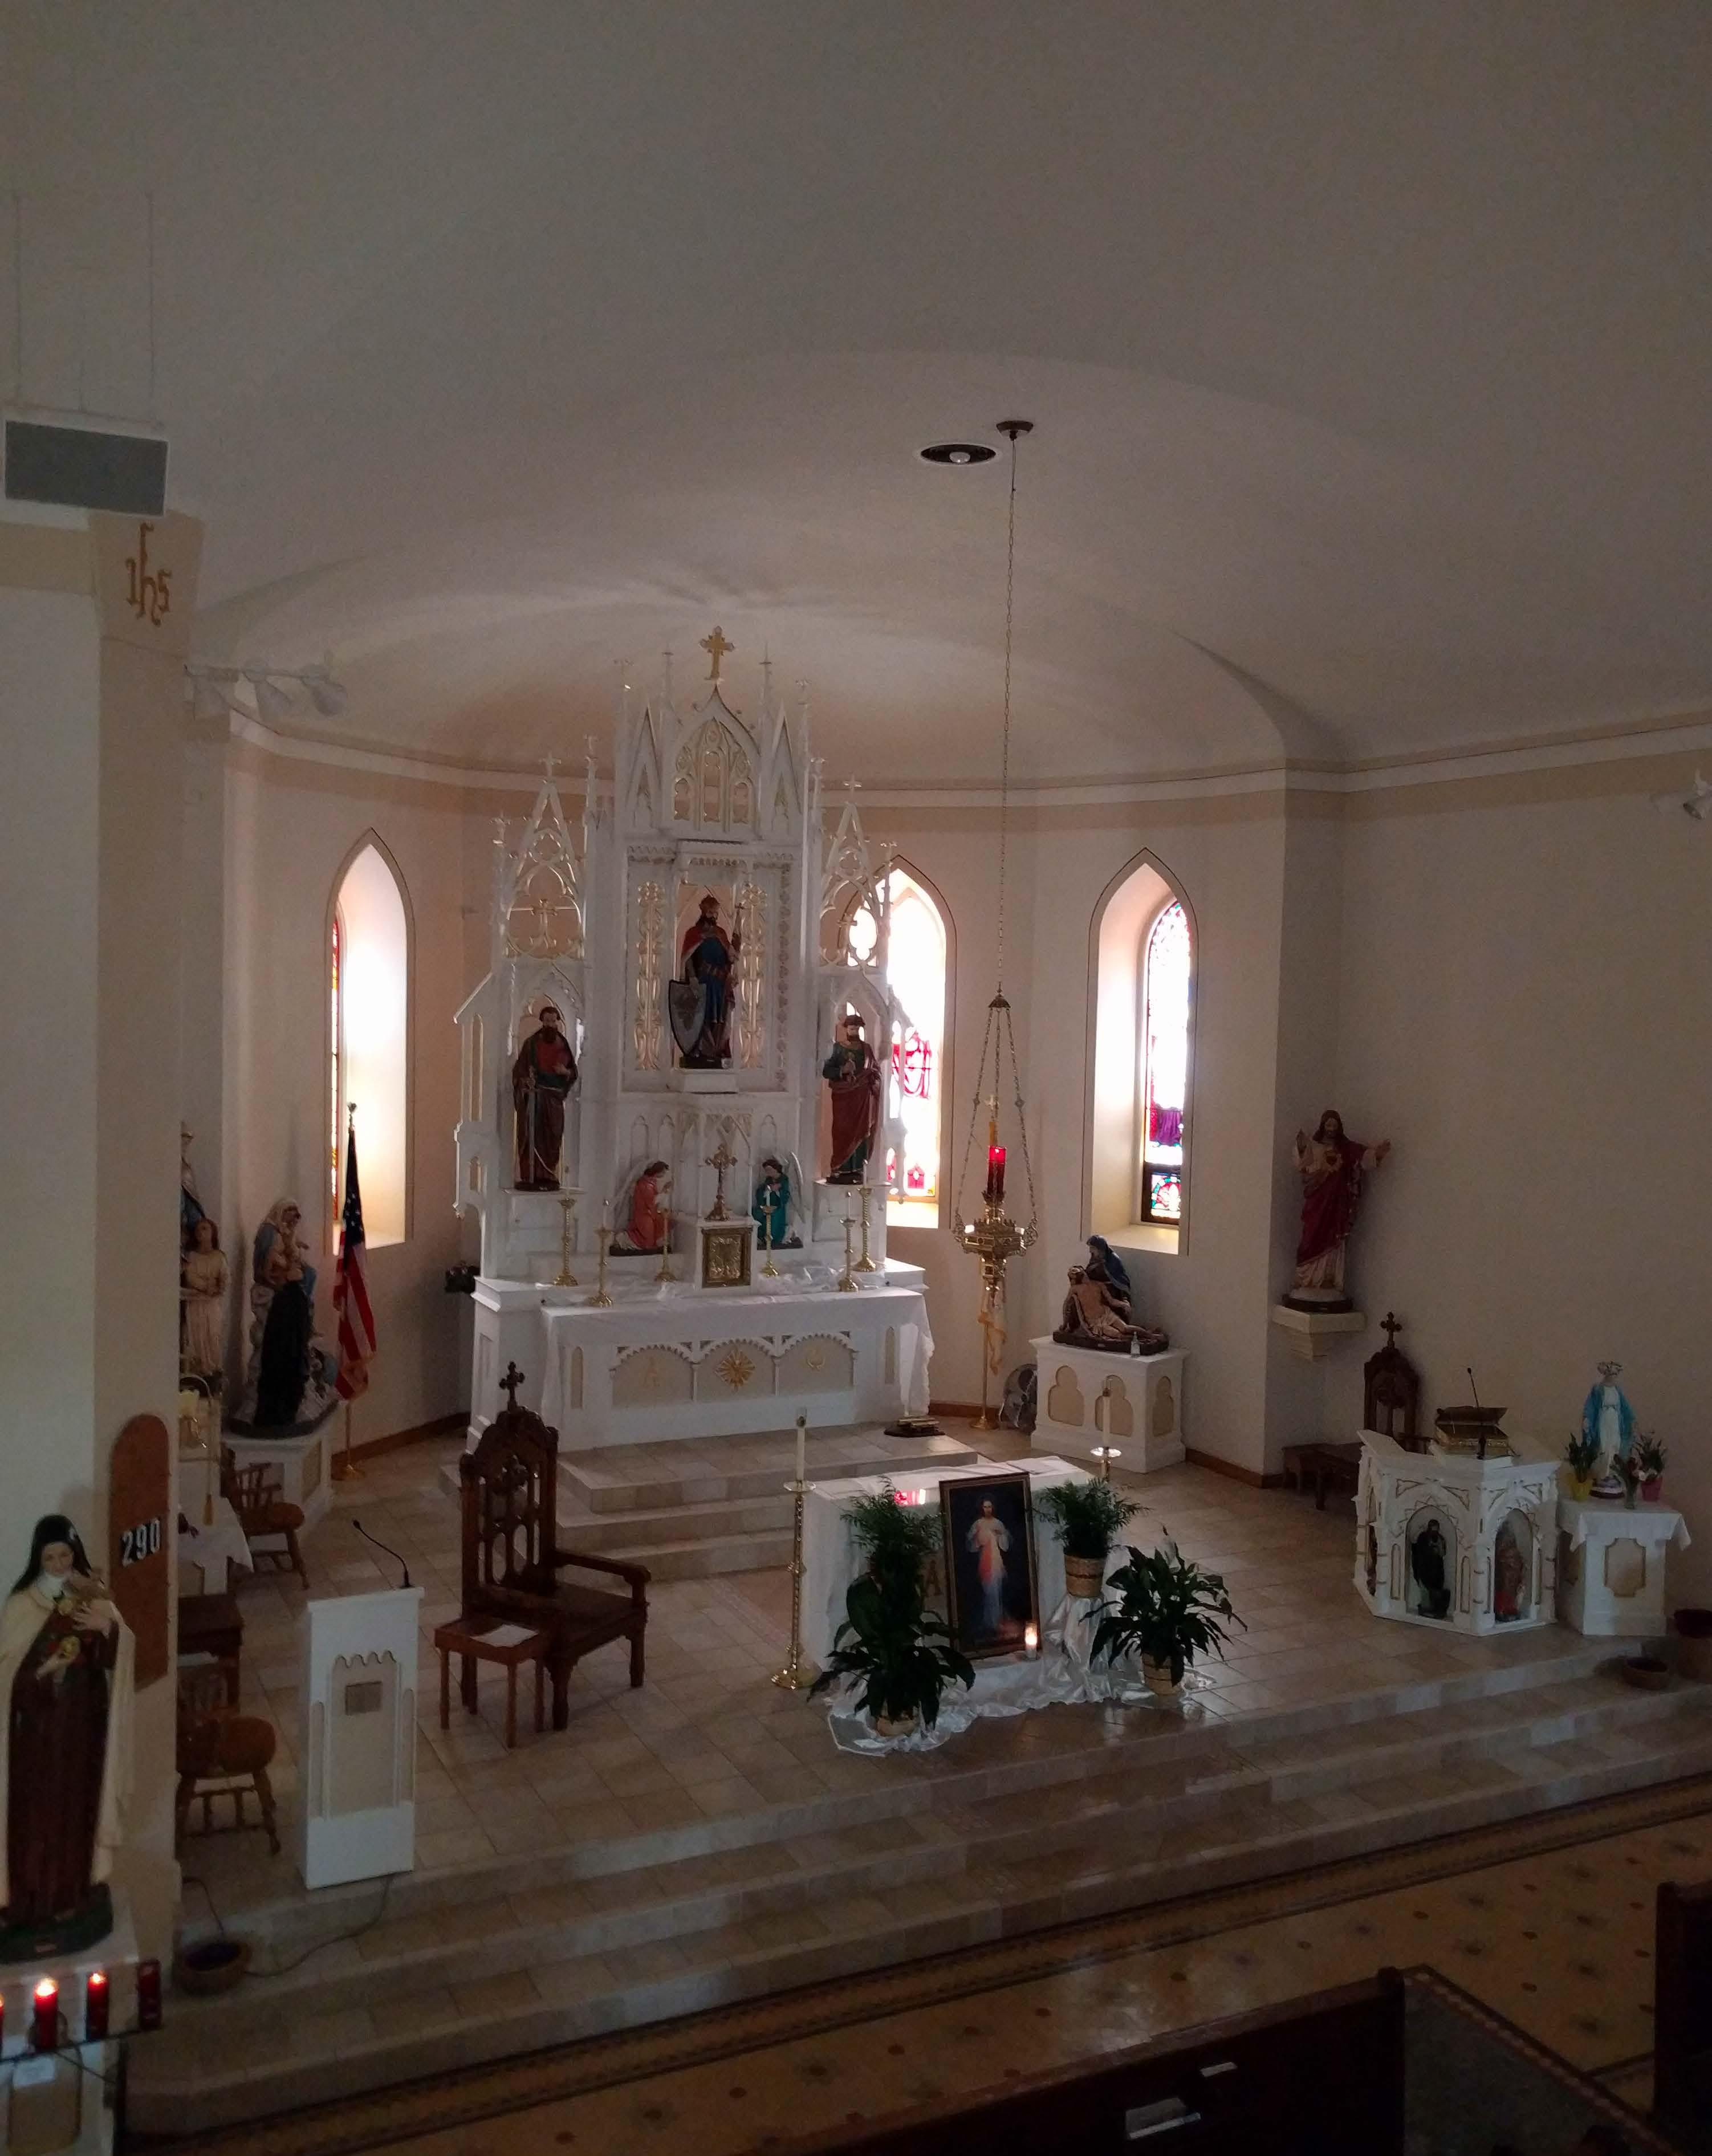 St. Wenceslaus altar